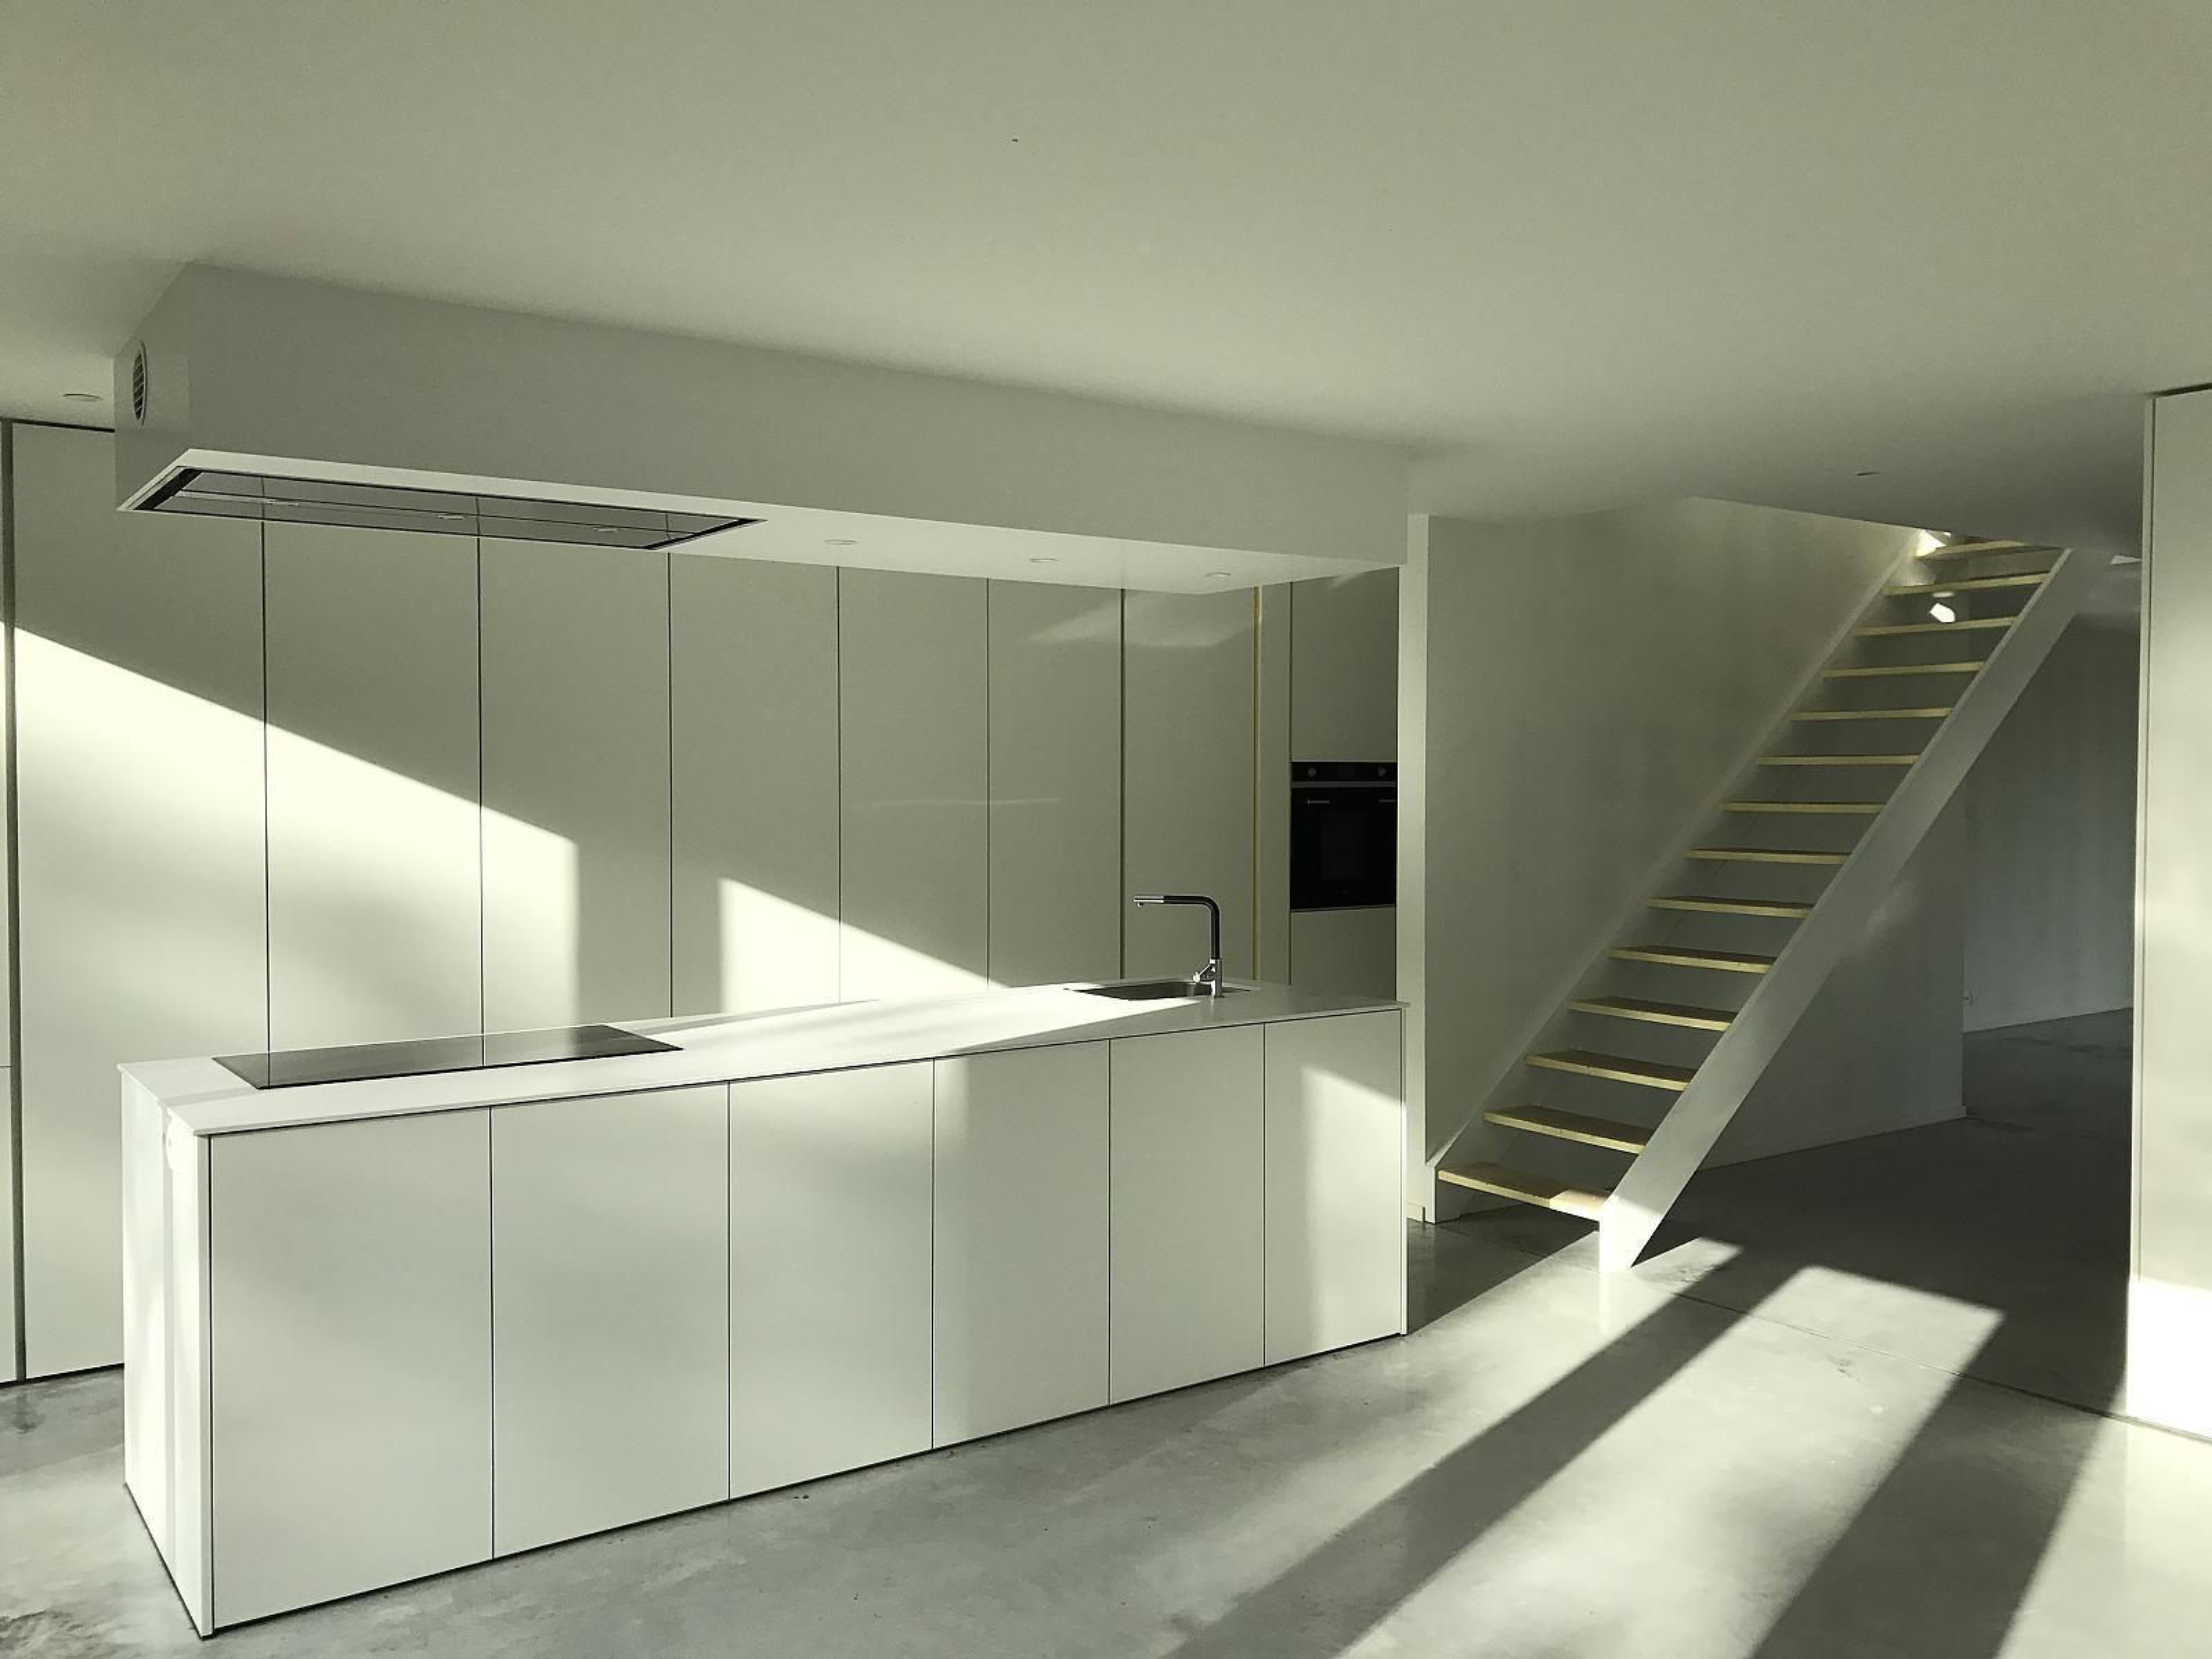 21592-keuken-trap